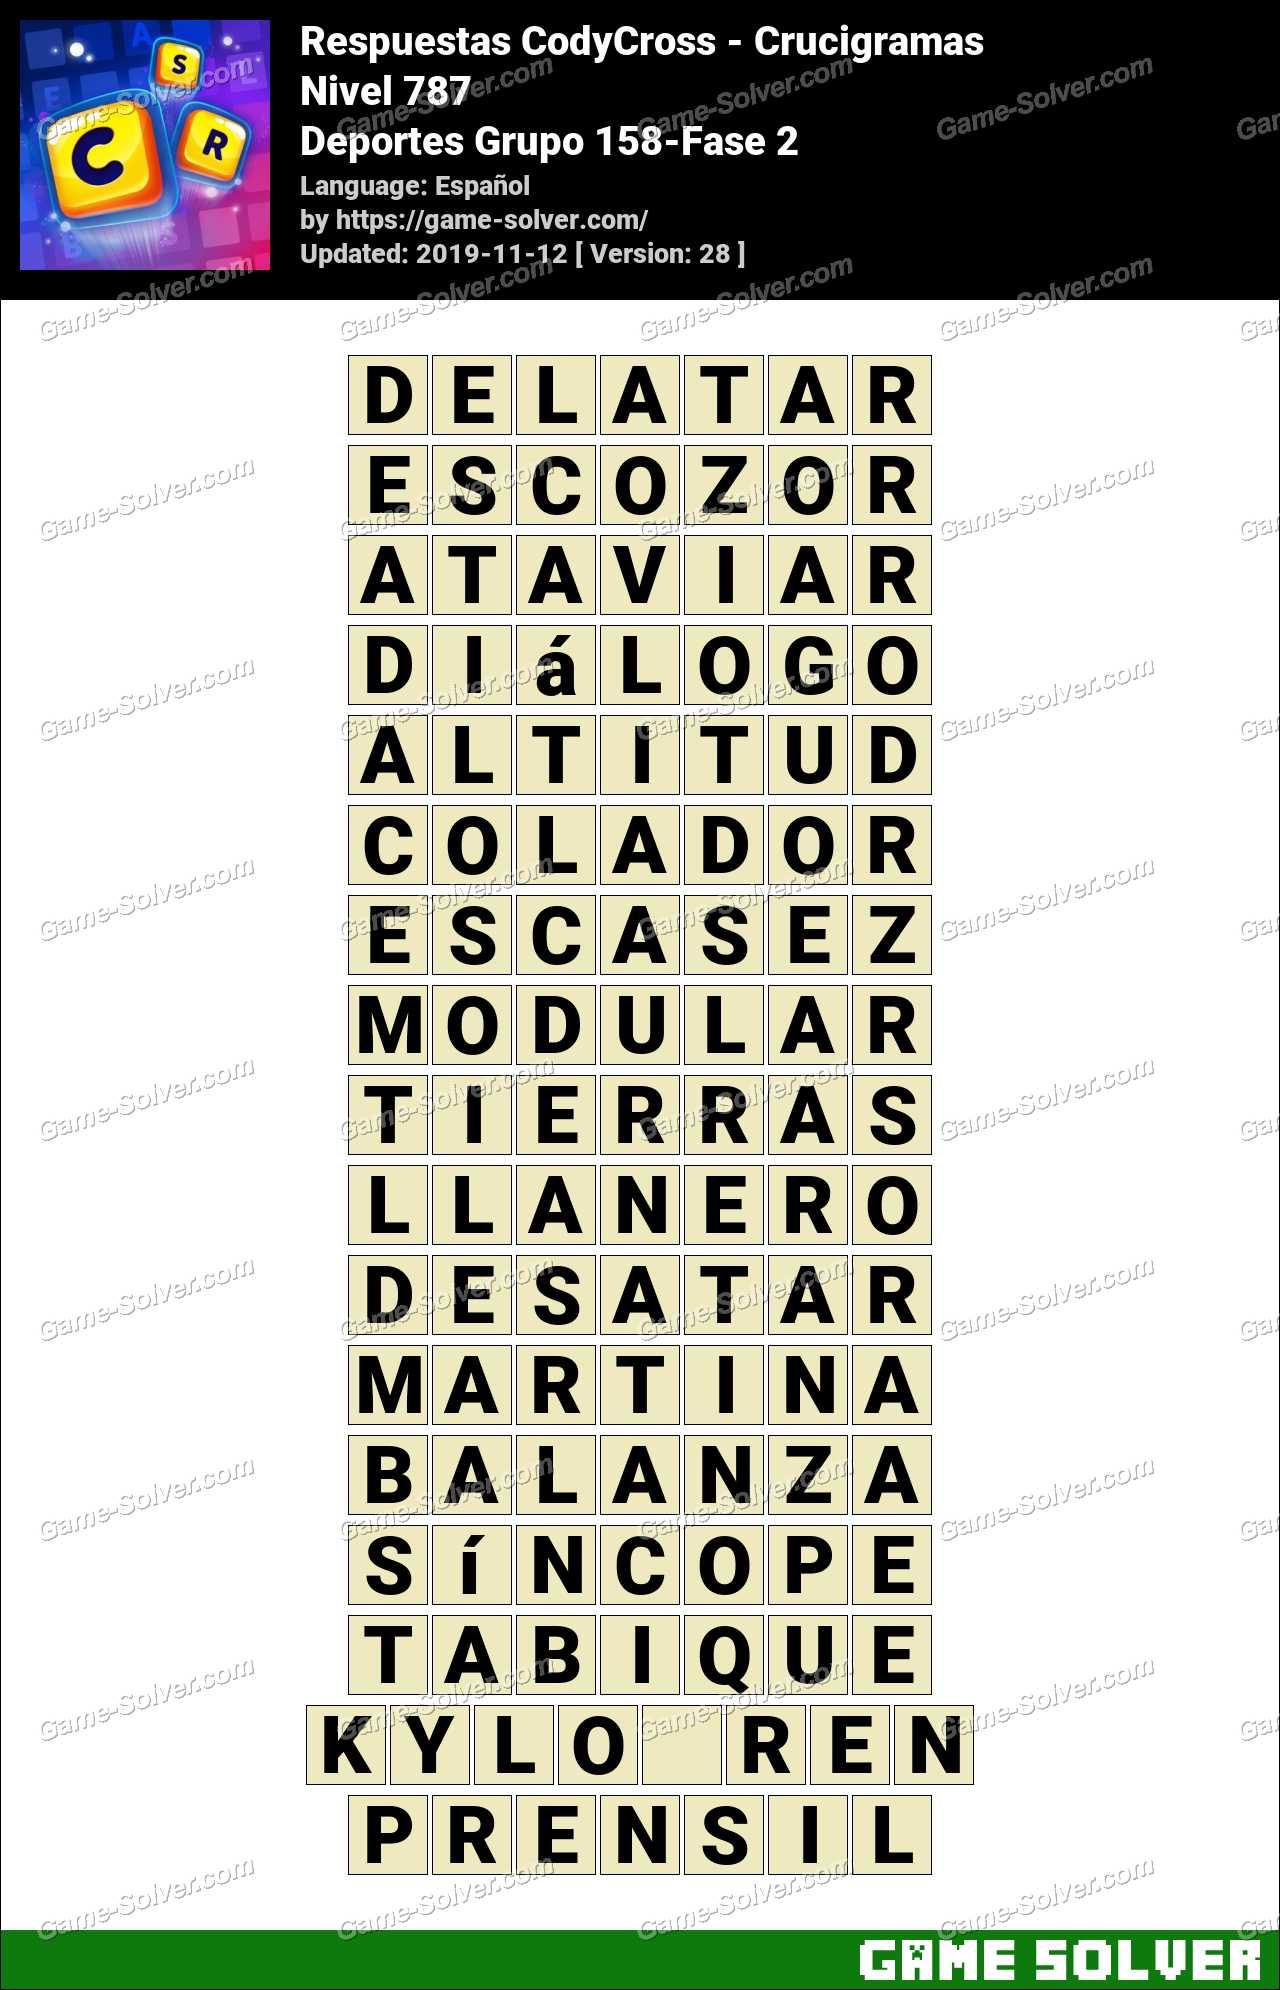 Respuestas CodyCross Deportes Grupo 158-Fase 2